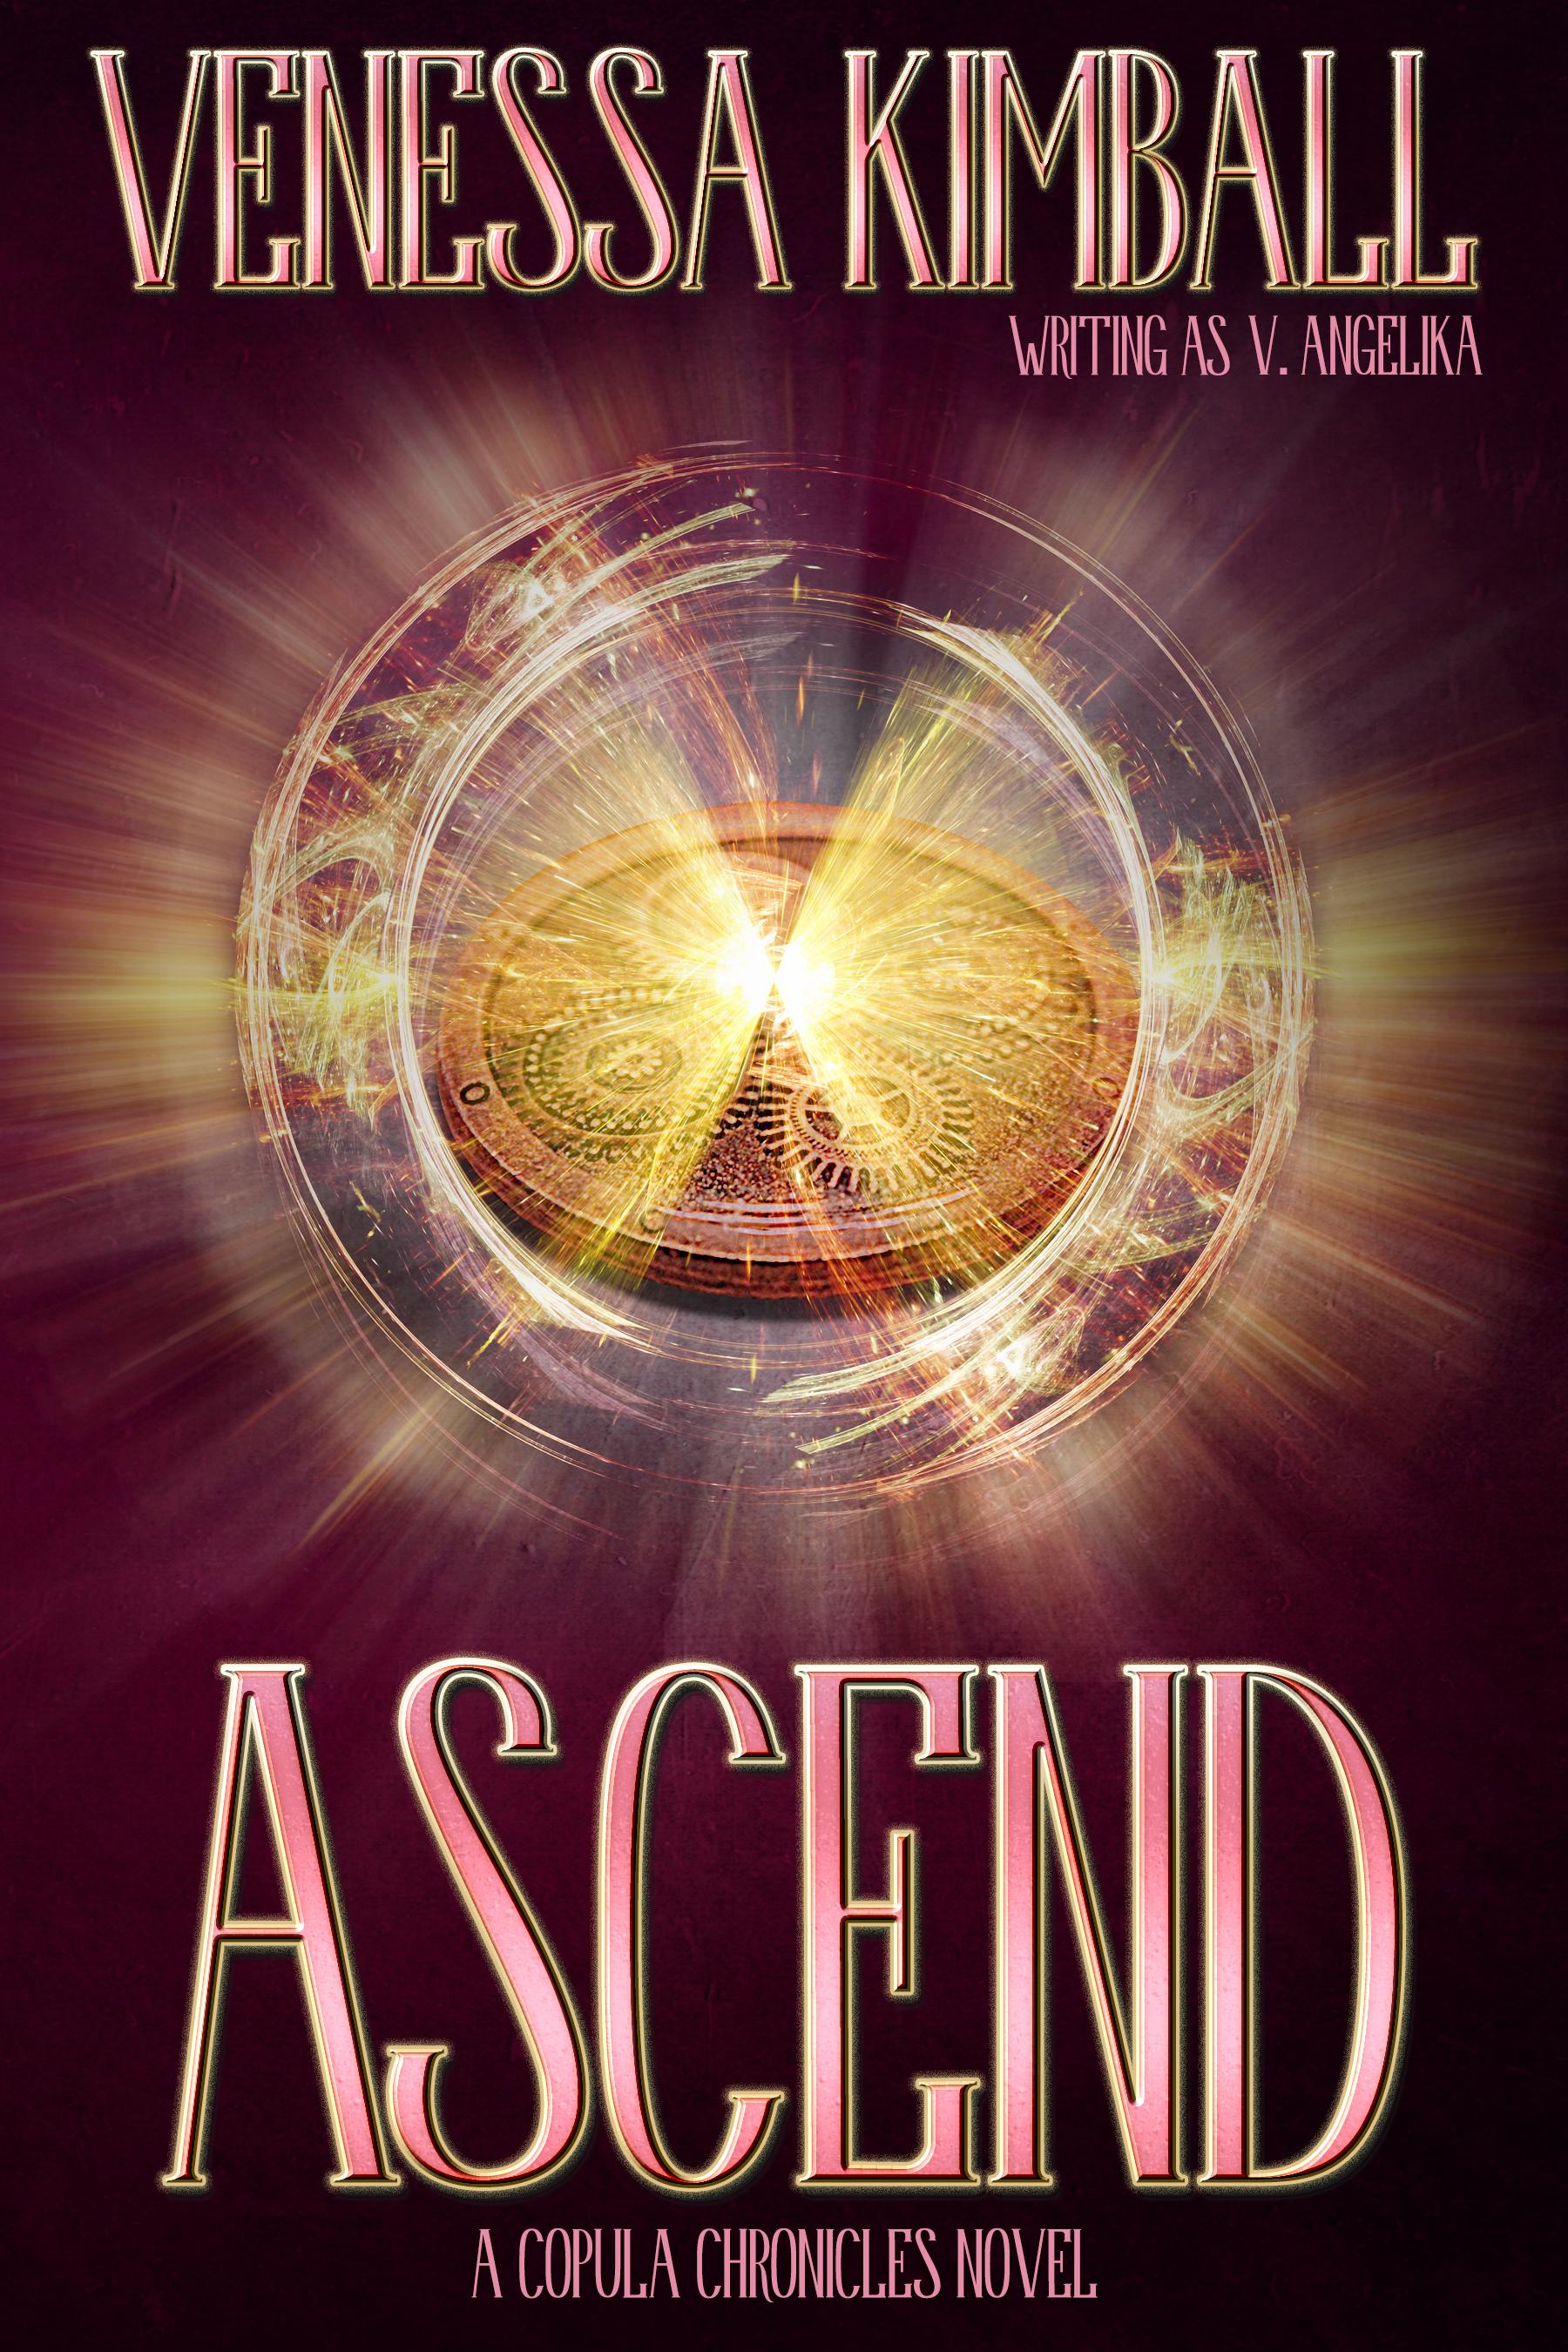 Venessa_Kimball_Ascend_Ebook_Full_Size